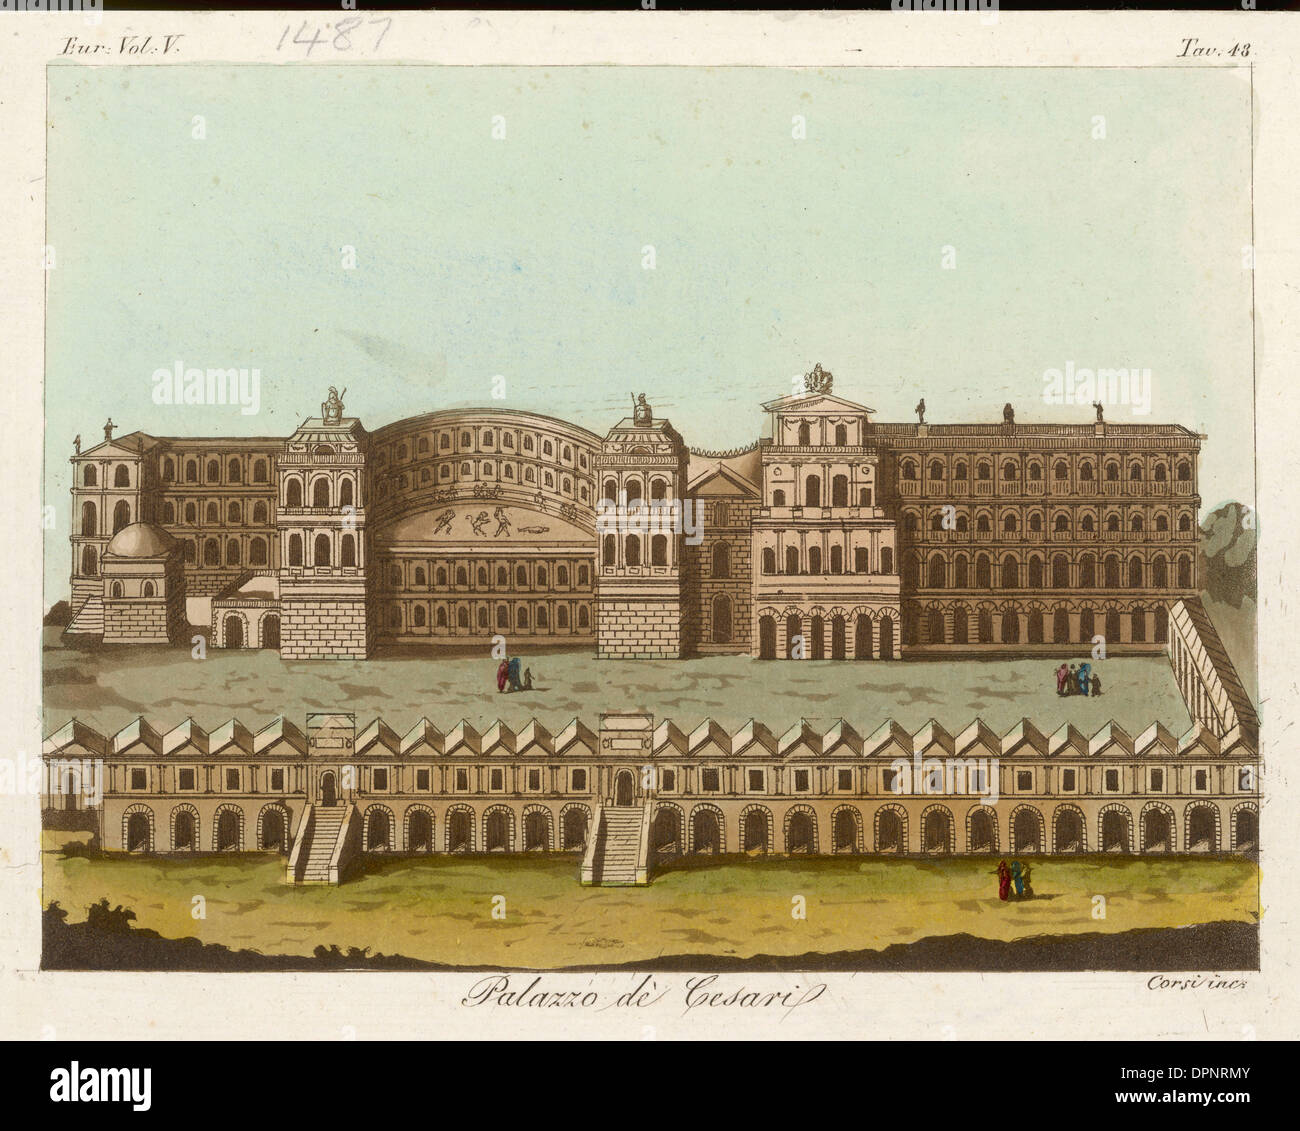 ROME - CAESAR'S PALACE - Stock Image